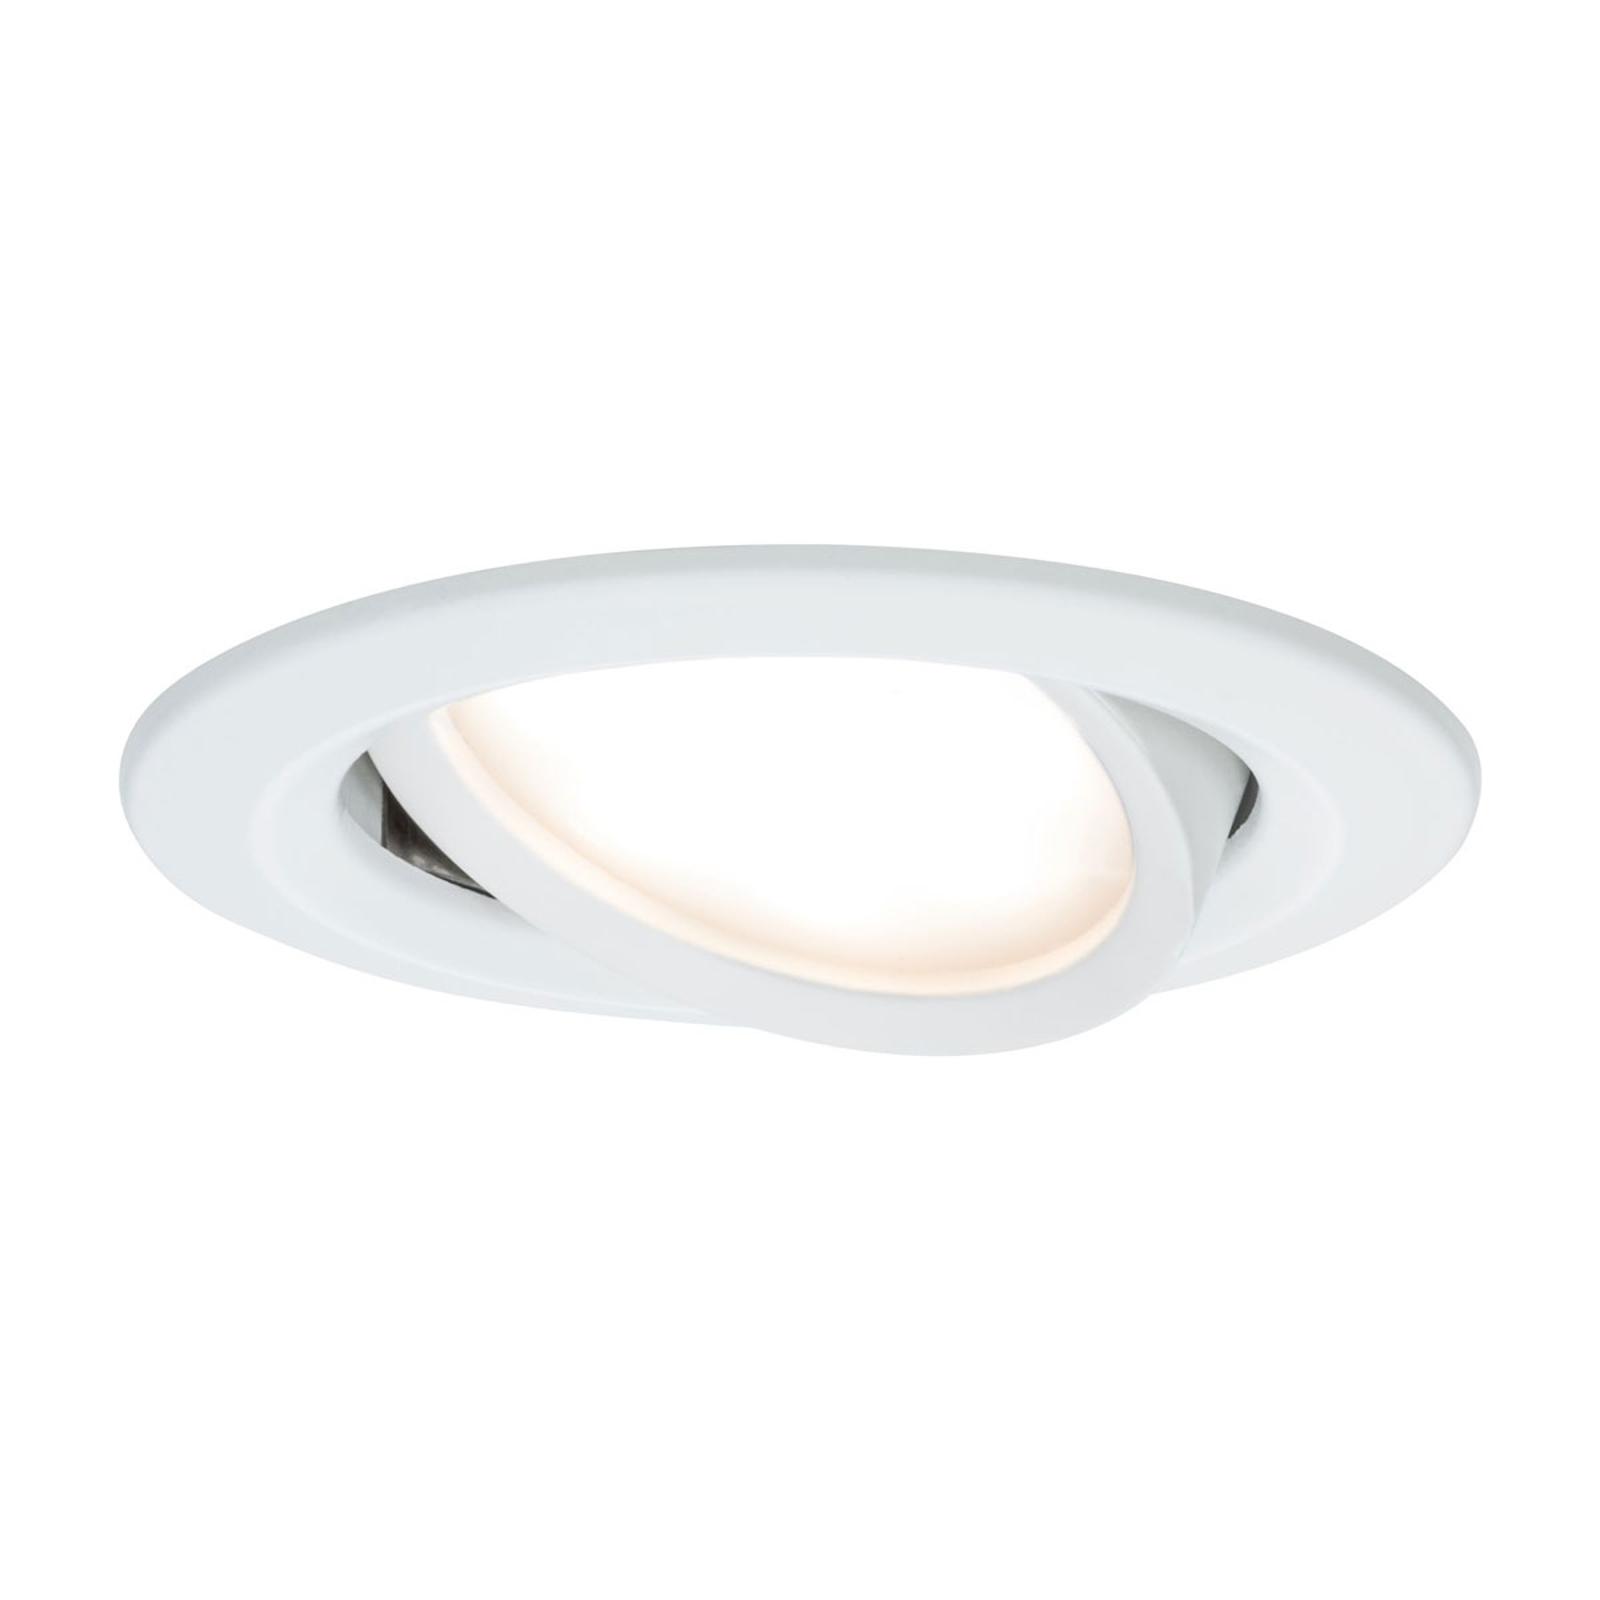 Paulmann 3er-LED-Spot Slim Coin, schwenkbar, weiß